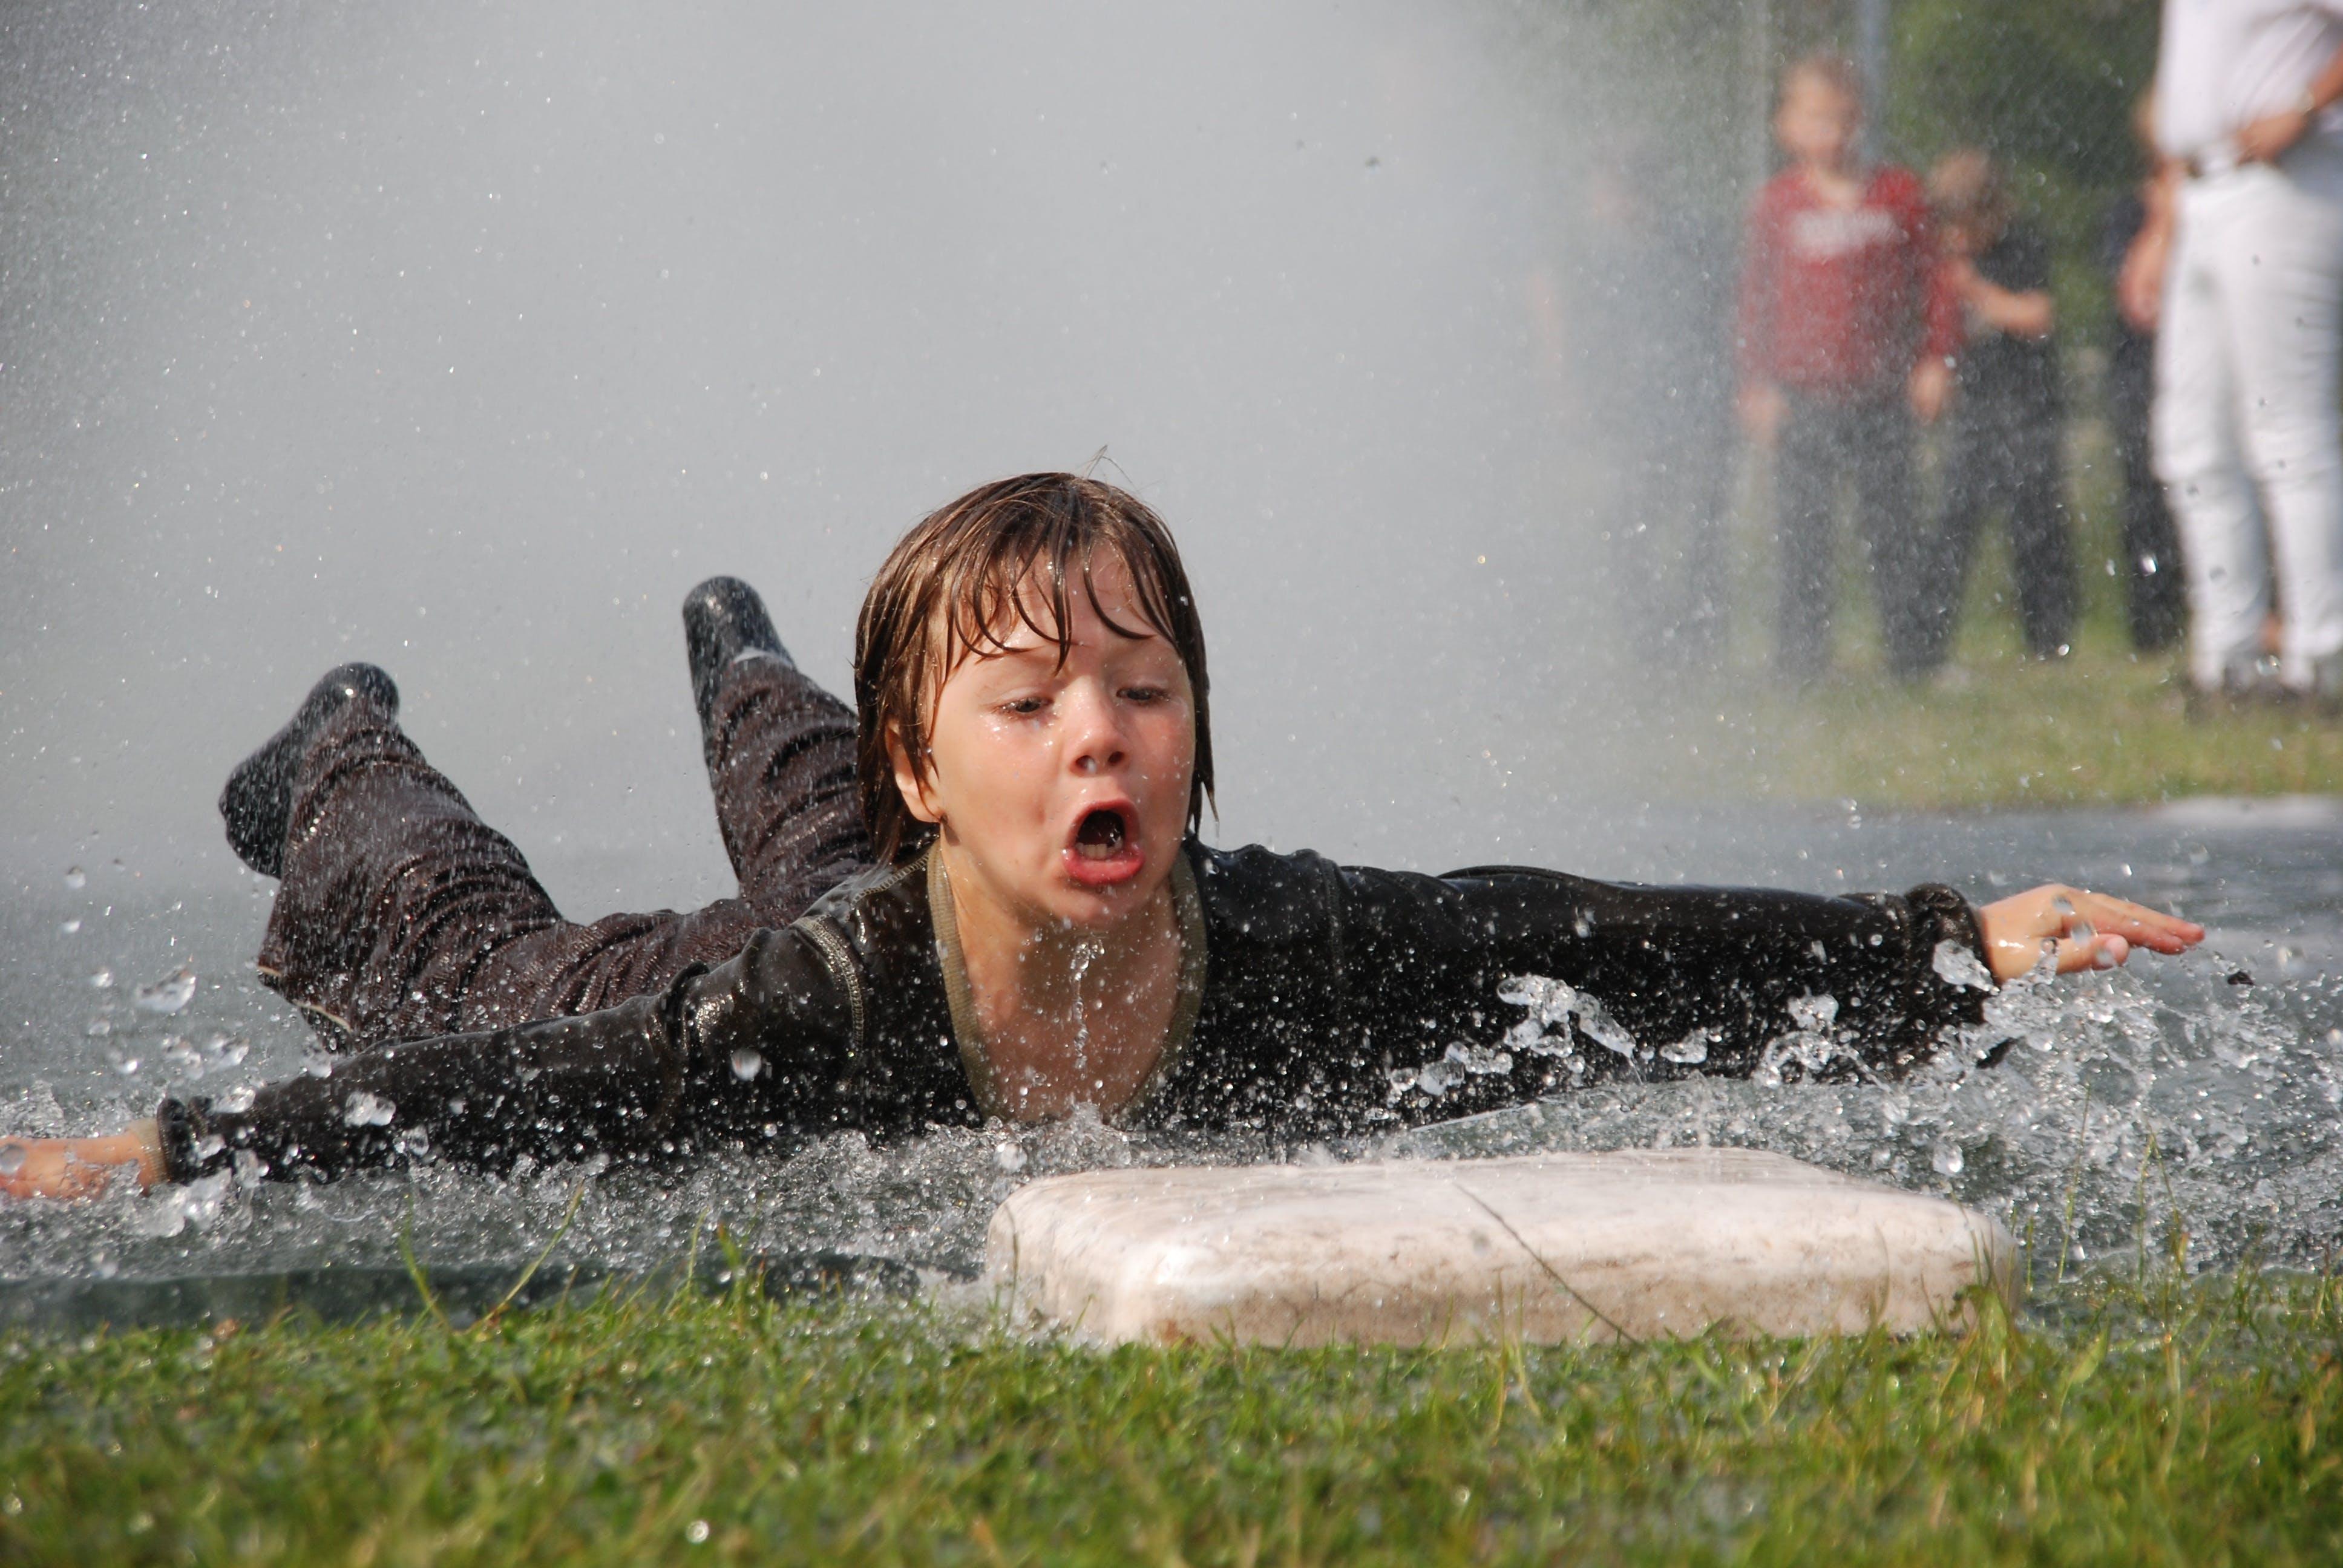 Boy Wearing Black Long Sleeve Shirt Sliding Near Green Grass